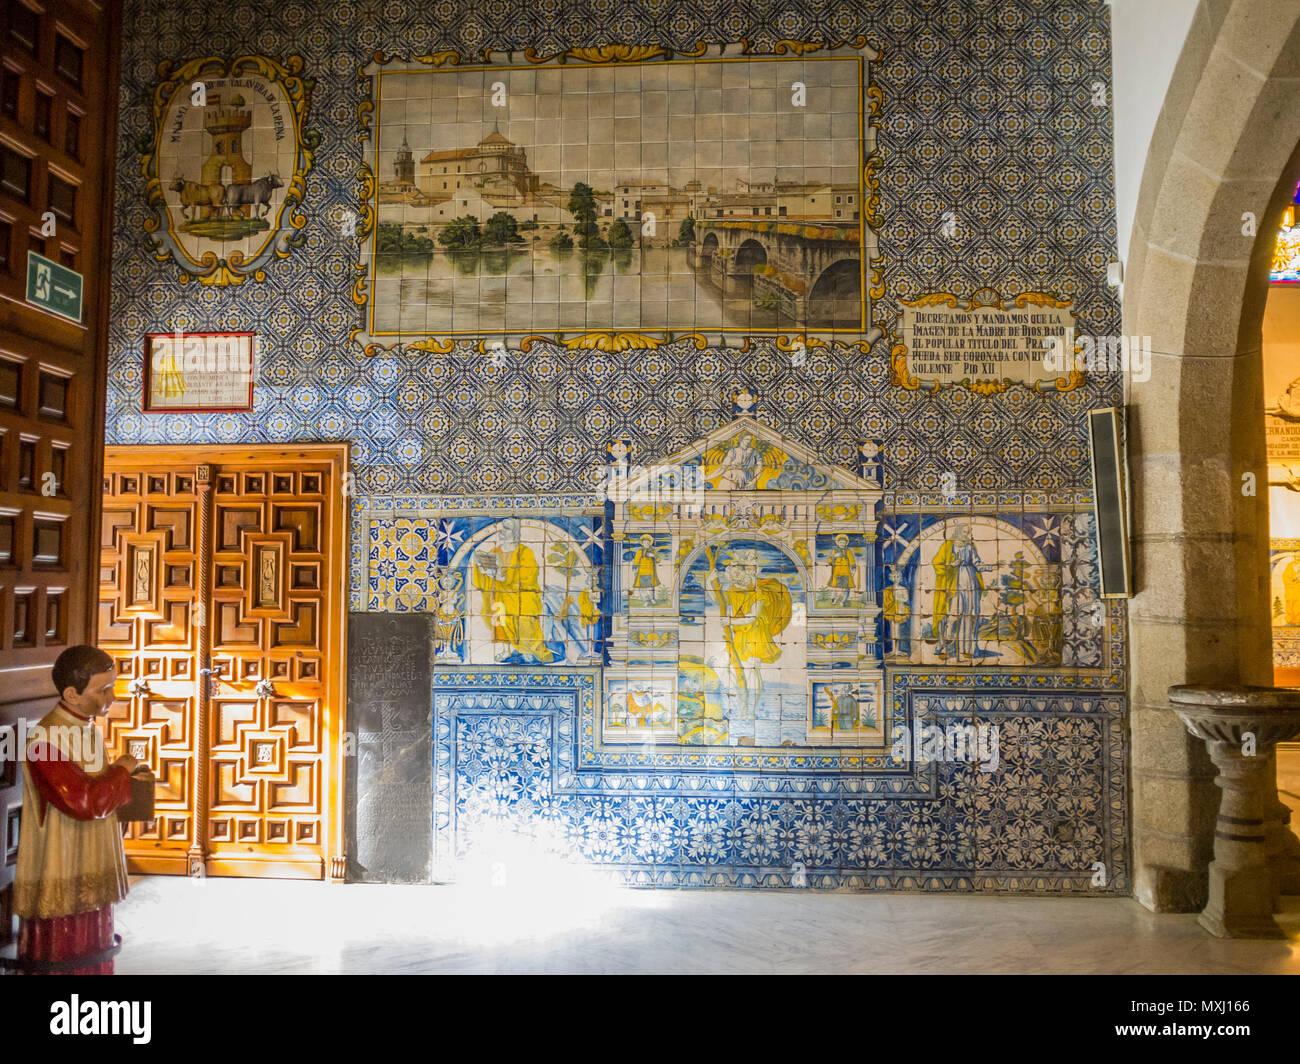 Spain castilla la toledo ceramic stock photos spain for Calle prado 8 talavera dela reina